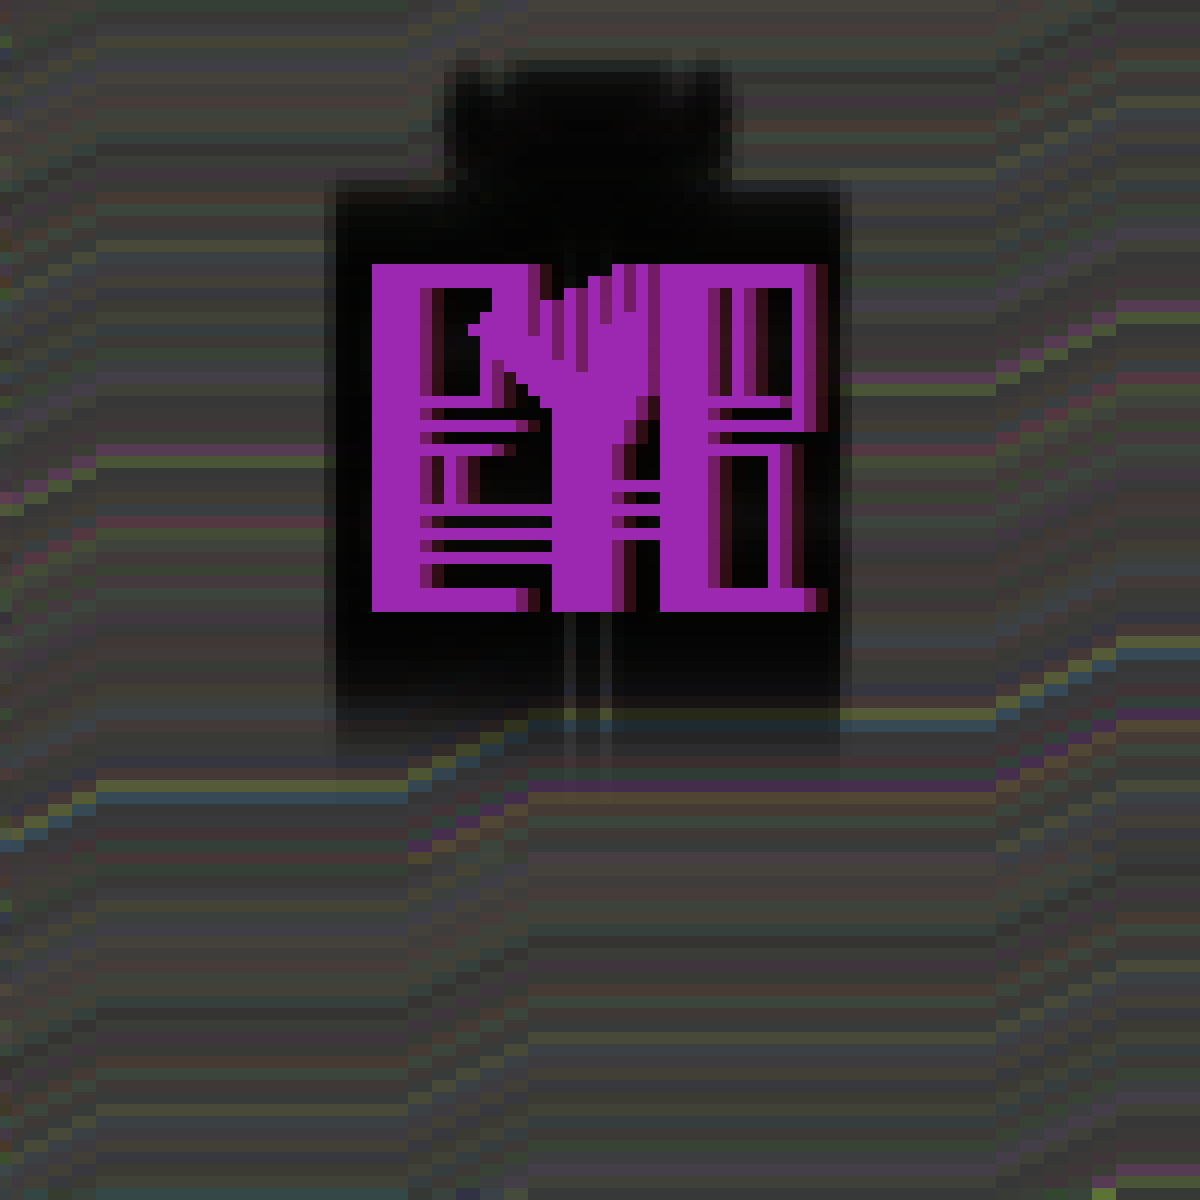 E.Y.E. by Loyopp